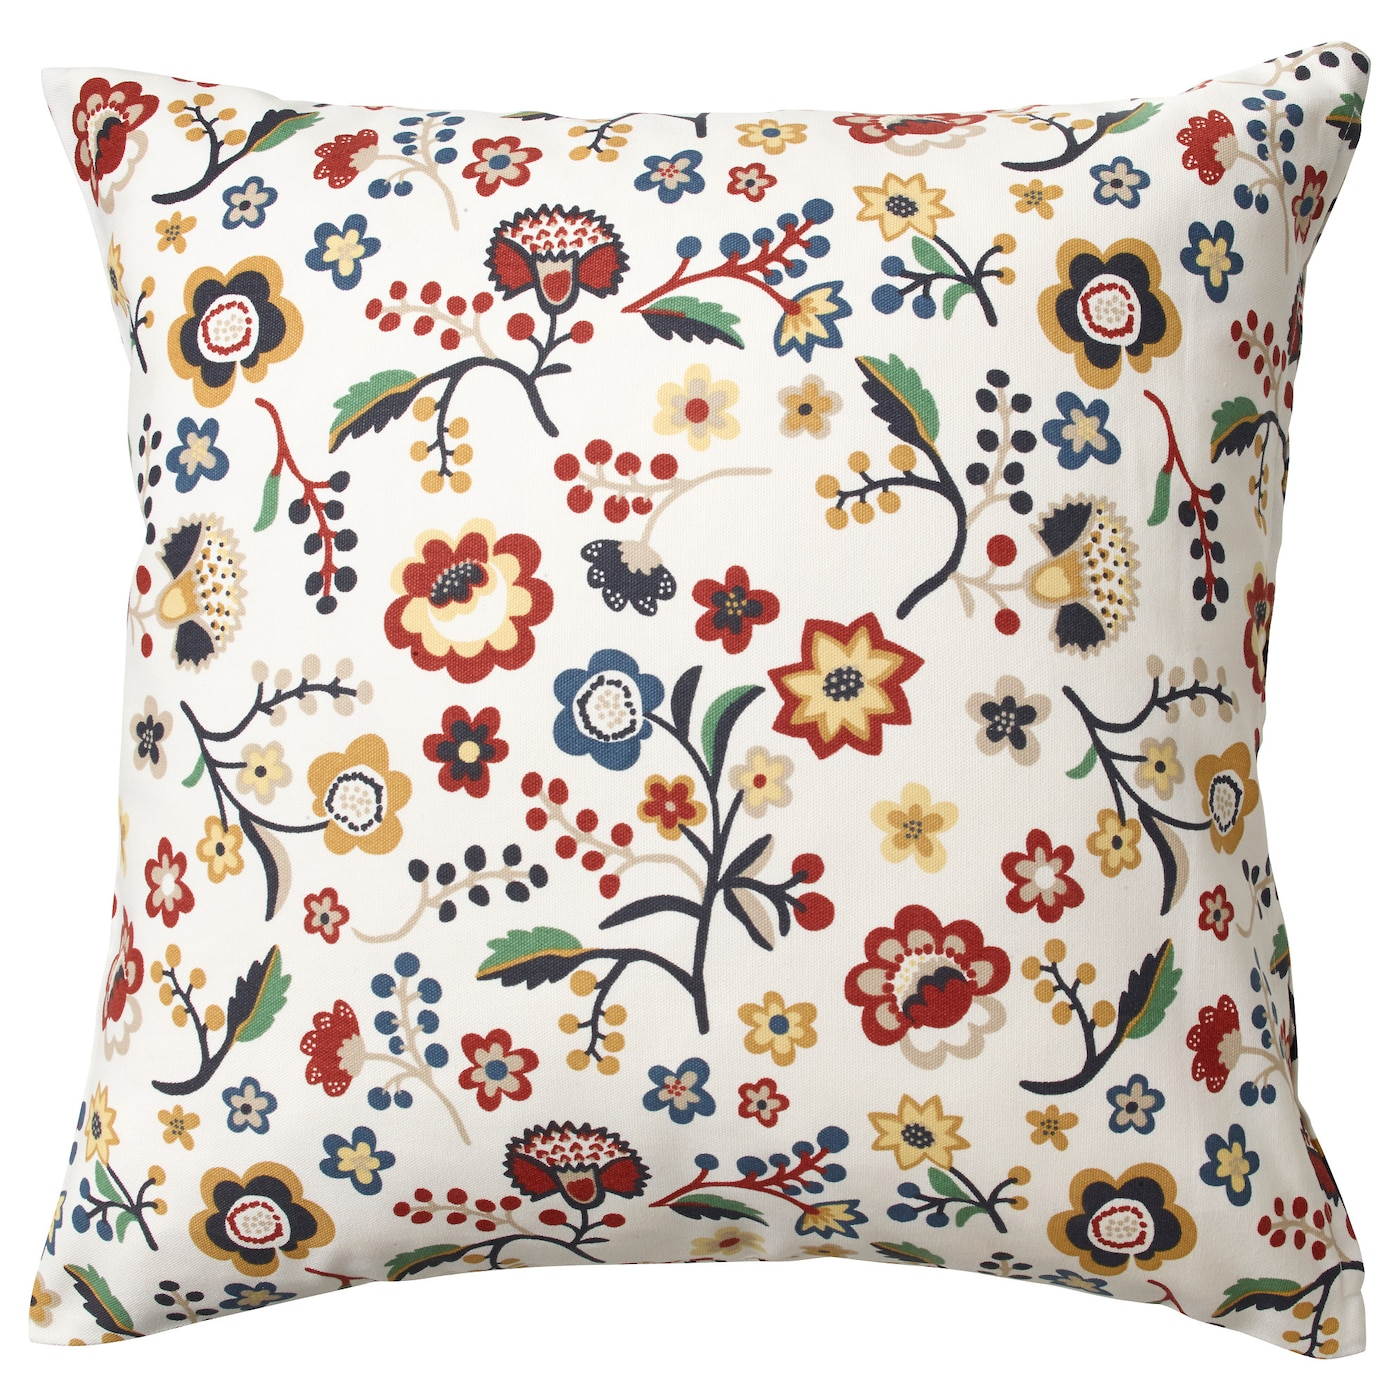 Home Textiles & Soft Furnishings | IKEA Ireland - Dublin